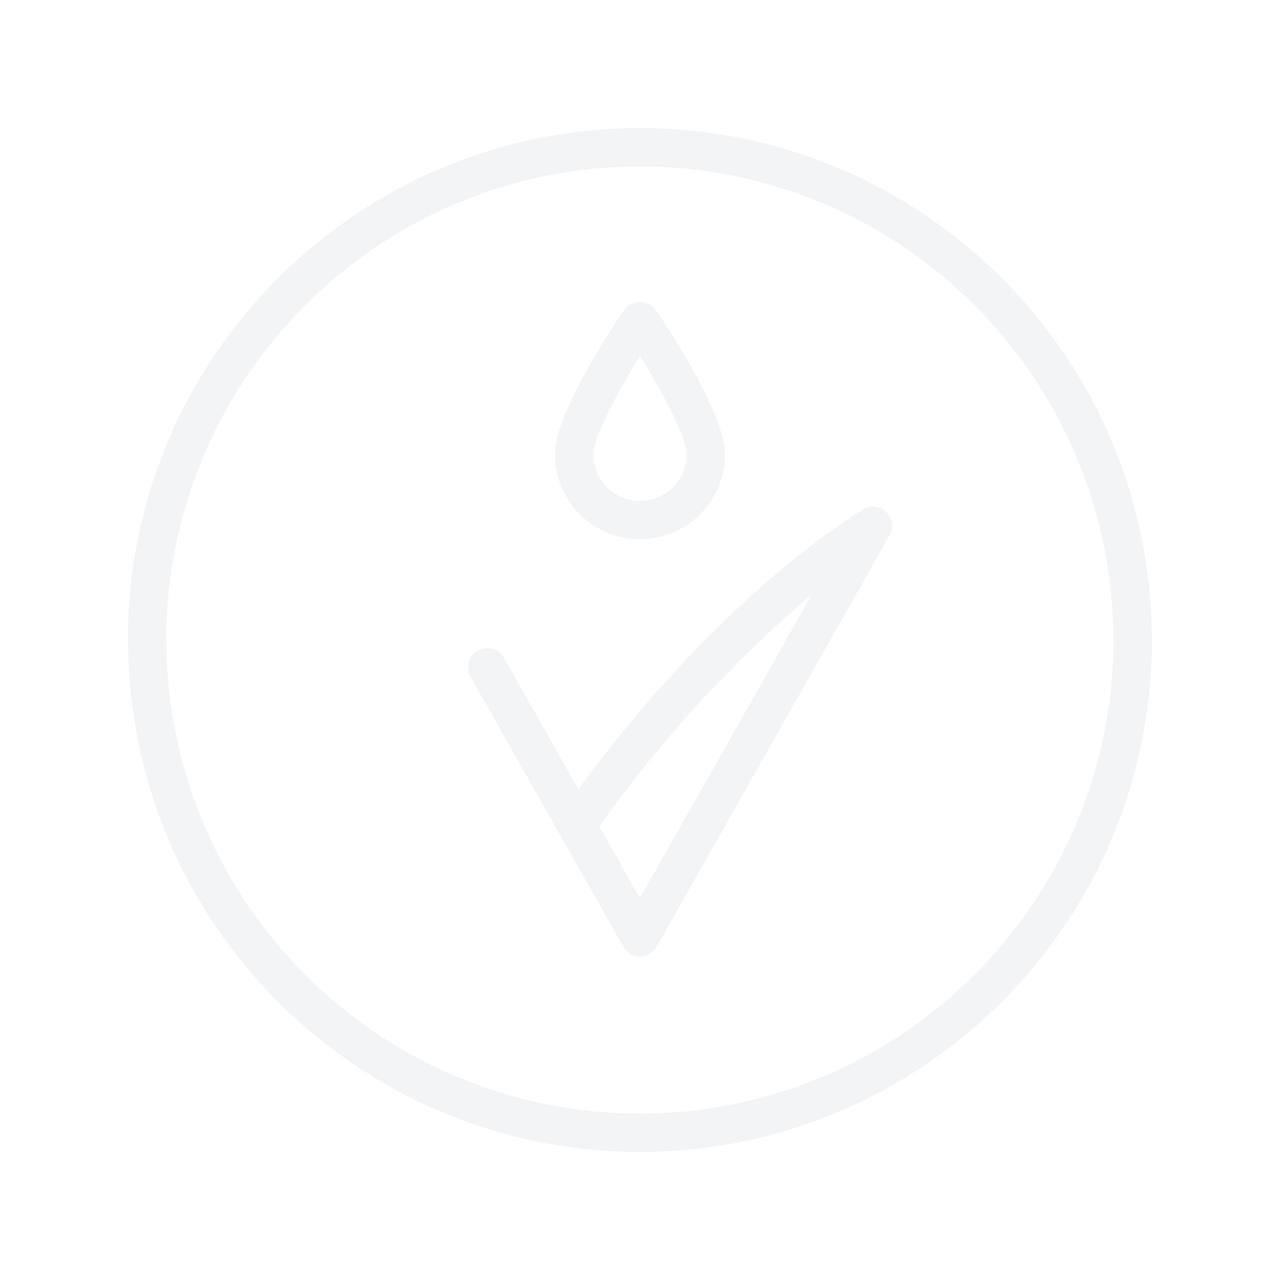 MAKEUP REVOLUTION I Love Makeup Chocolate Highligher 11.2g